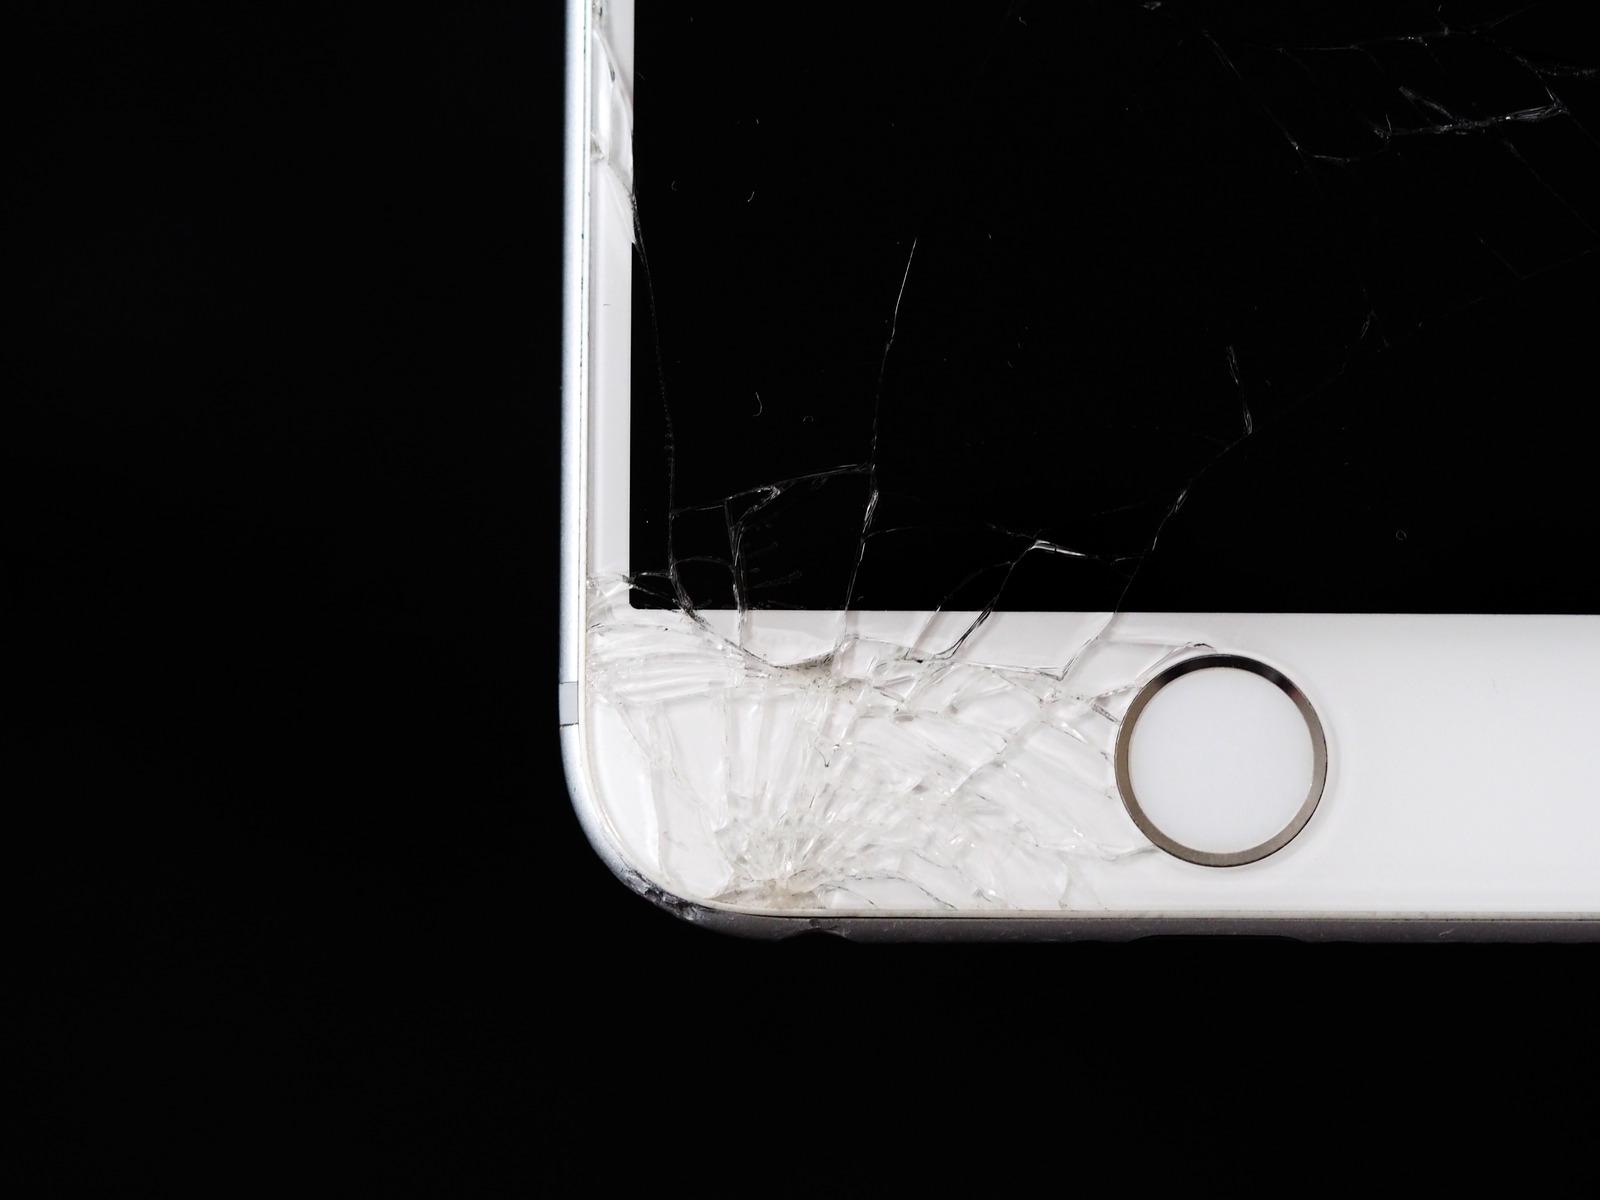 Ceny iPhone servisu